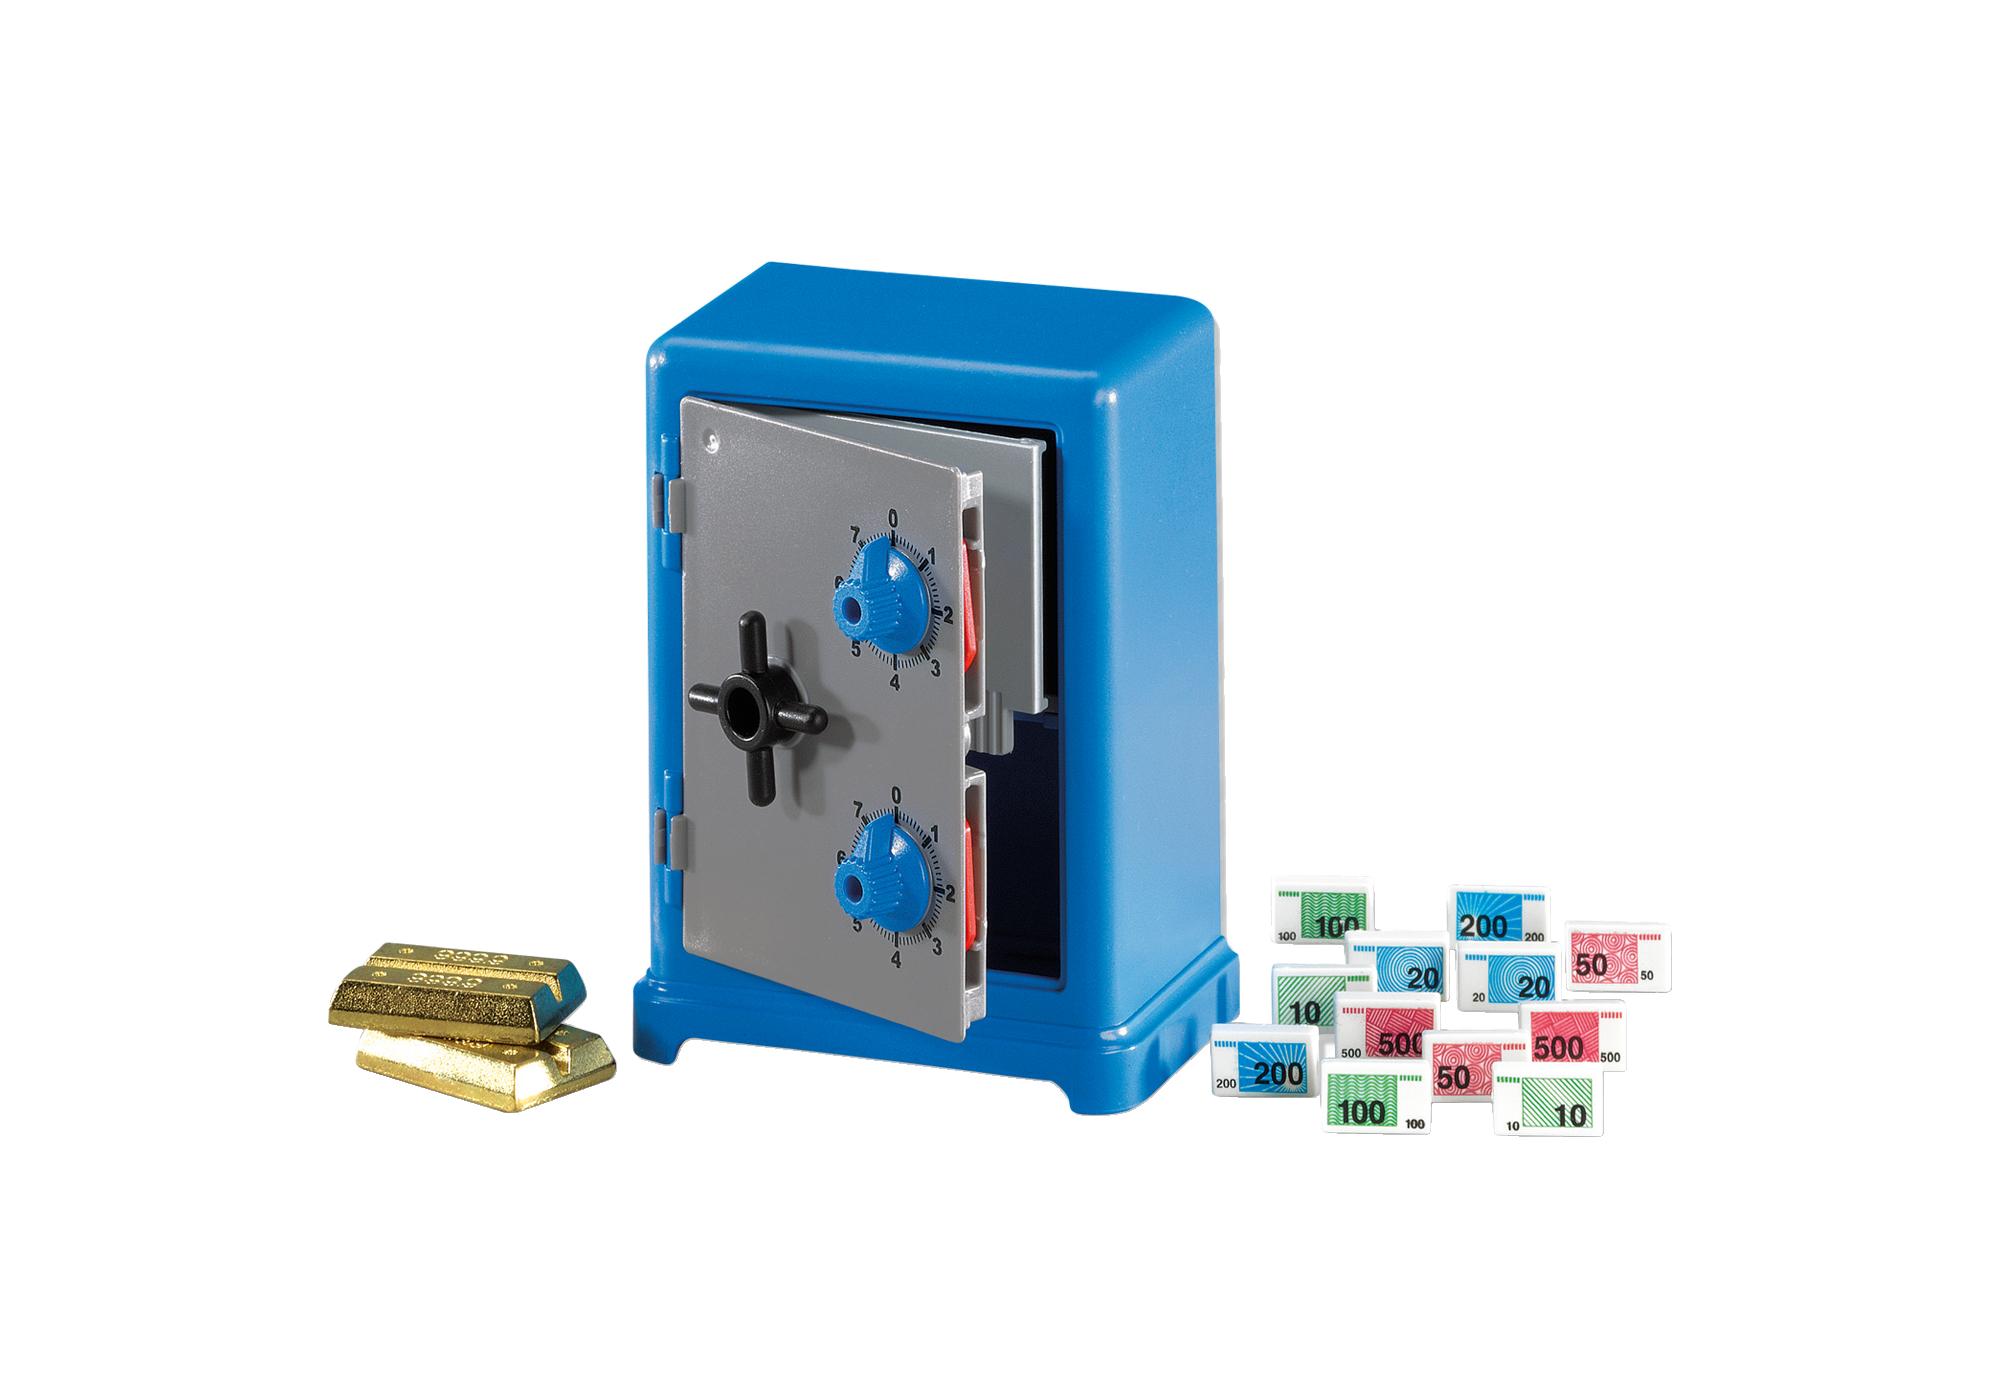 http://media.playmobil.com/i/playmobil/7446_product_detail/Caja Fuerte